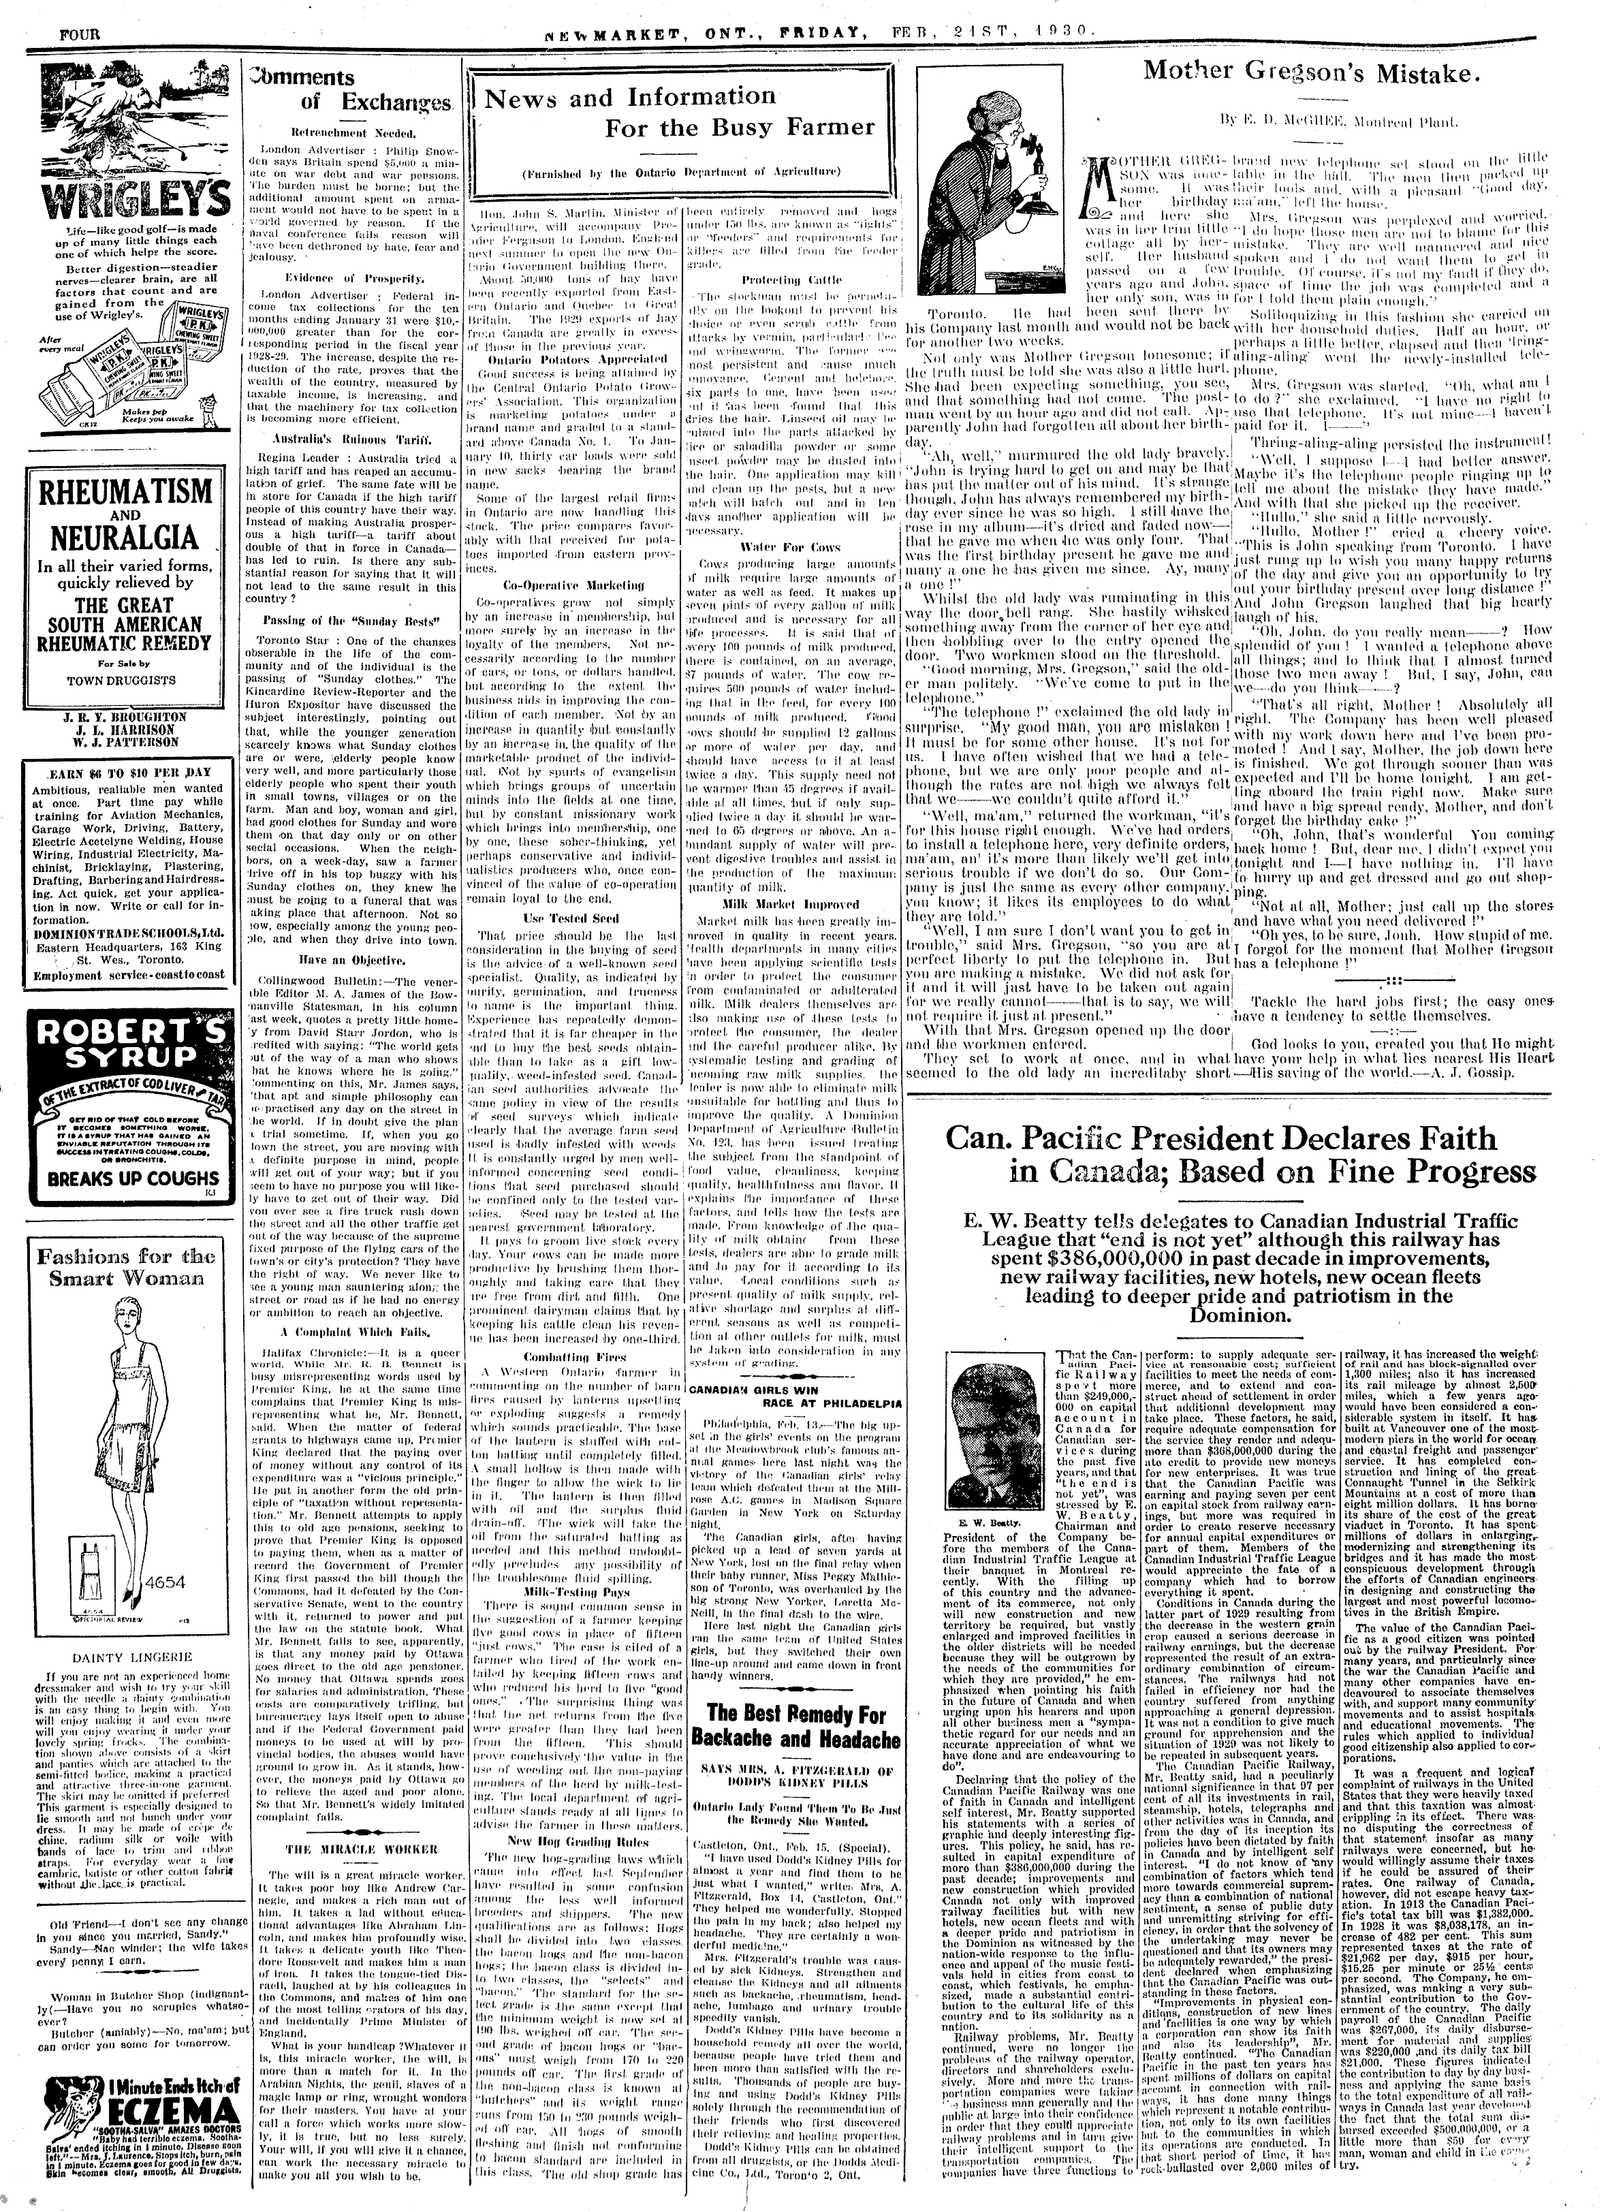 Newmarket Era (Newmarket, ON1861), February 21, 1930